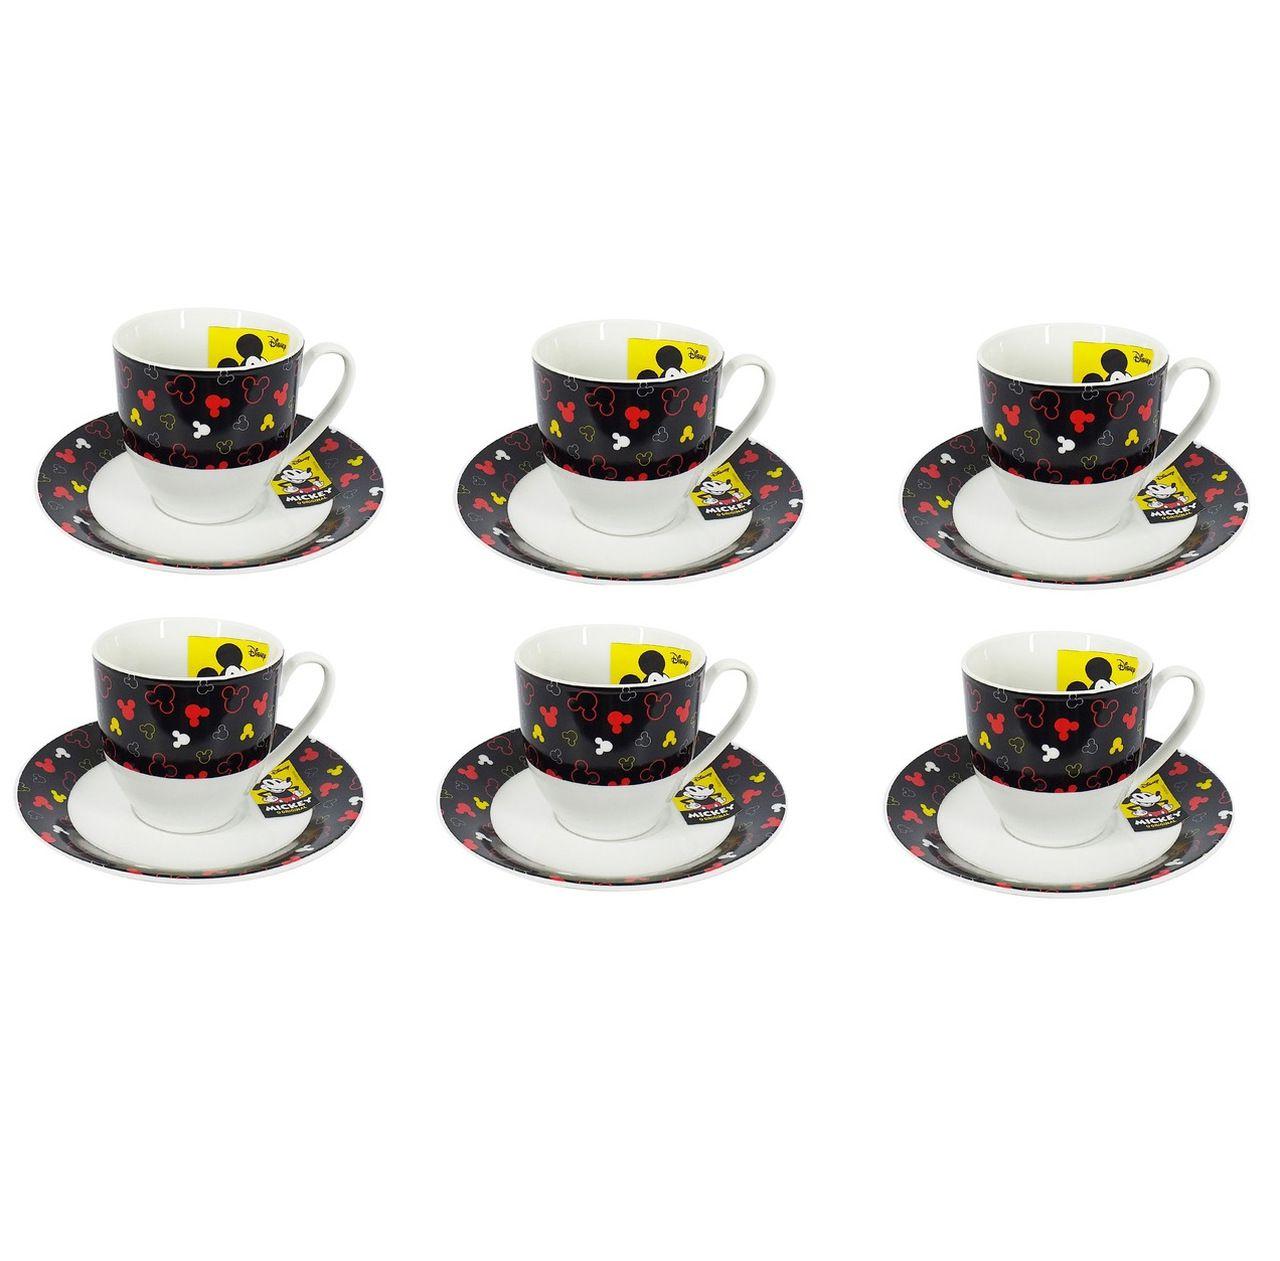 Conjunto de 6 Xícaras de Chá (Grande) Mickey Mouse: Disney (Preto)